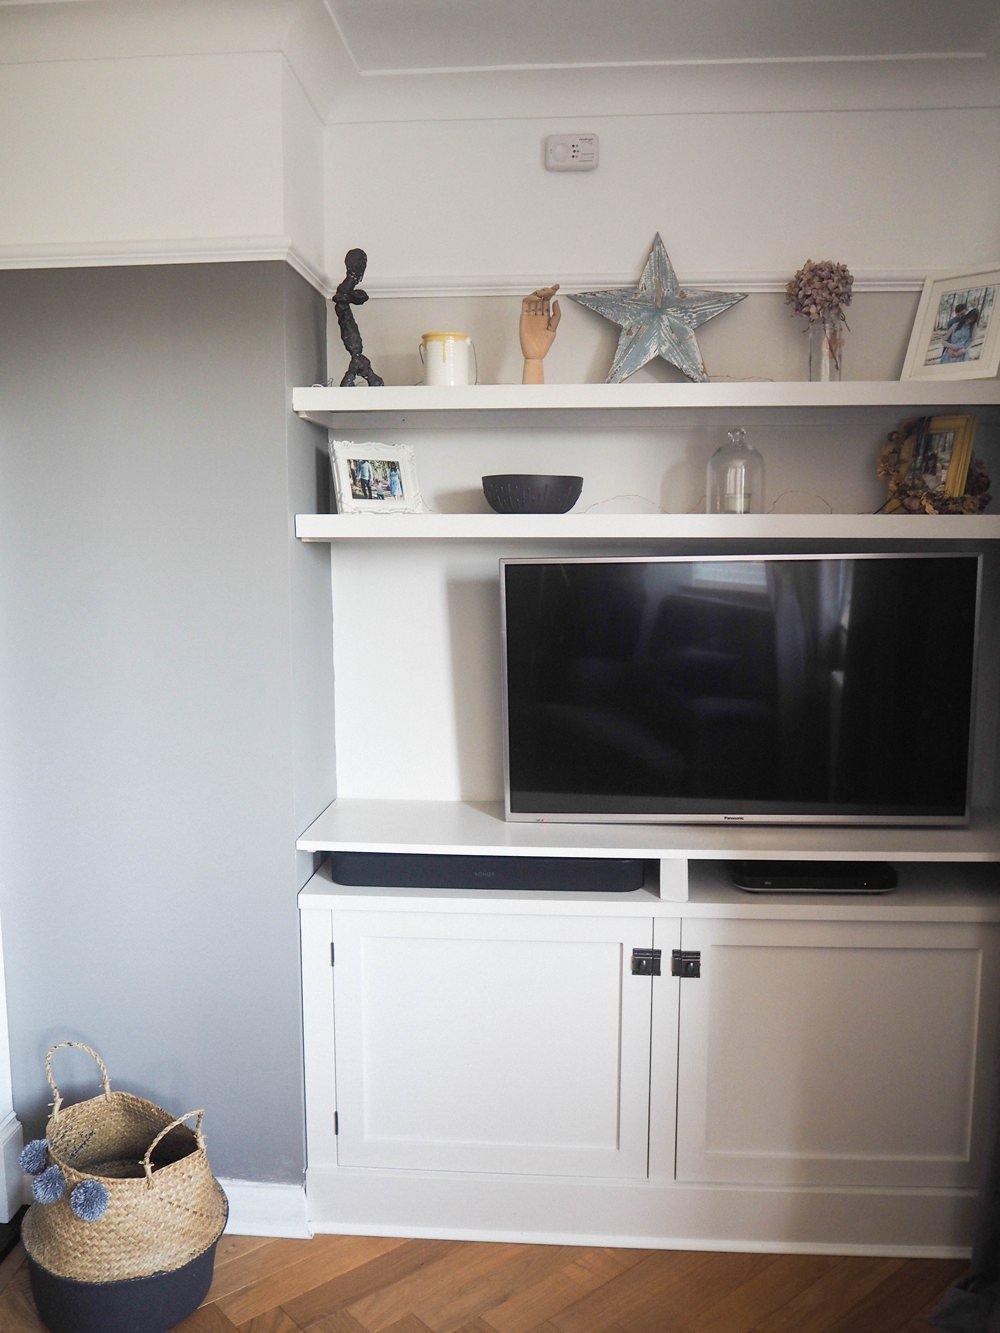 Built In TV Cupboard Alcove Shelf Shelving DIY 1930s House Living Room Renovation